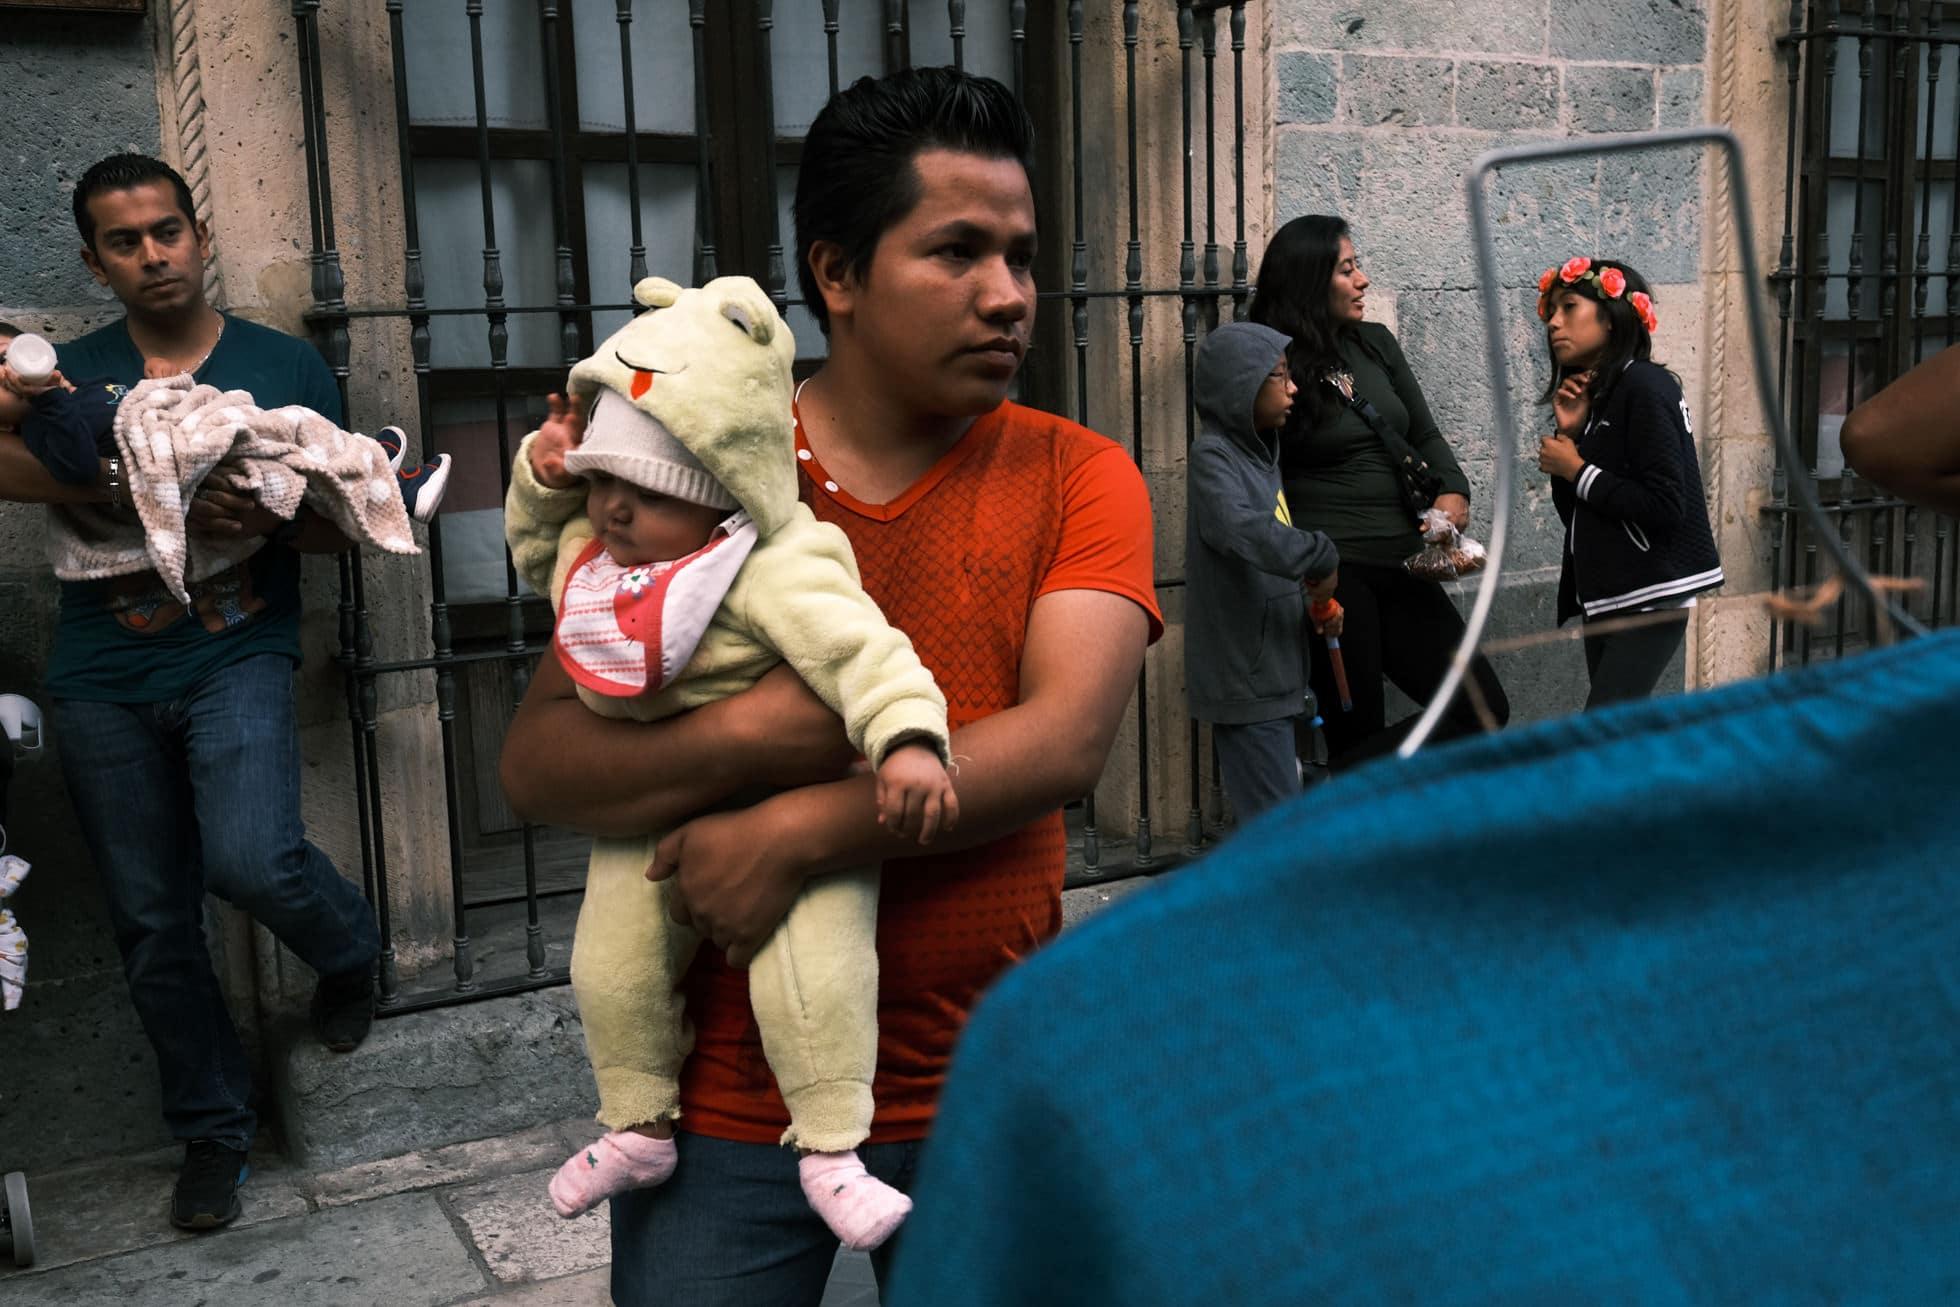 fujifilm-x-pro3-mexico-street-photography-76